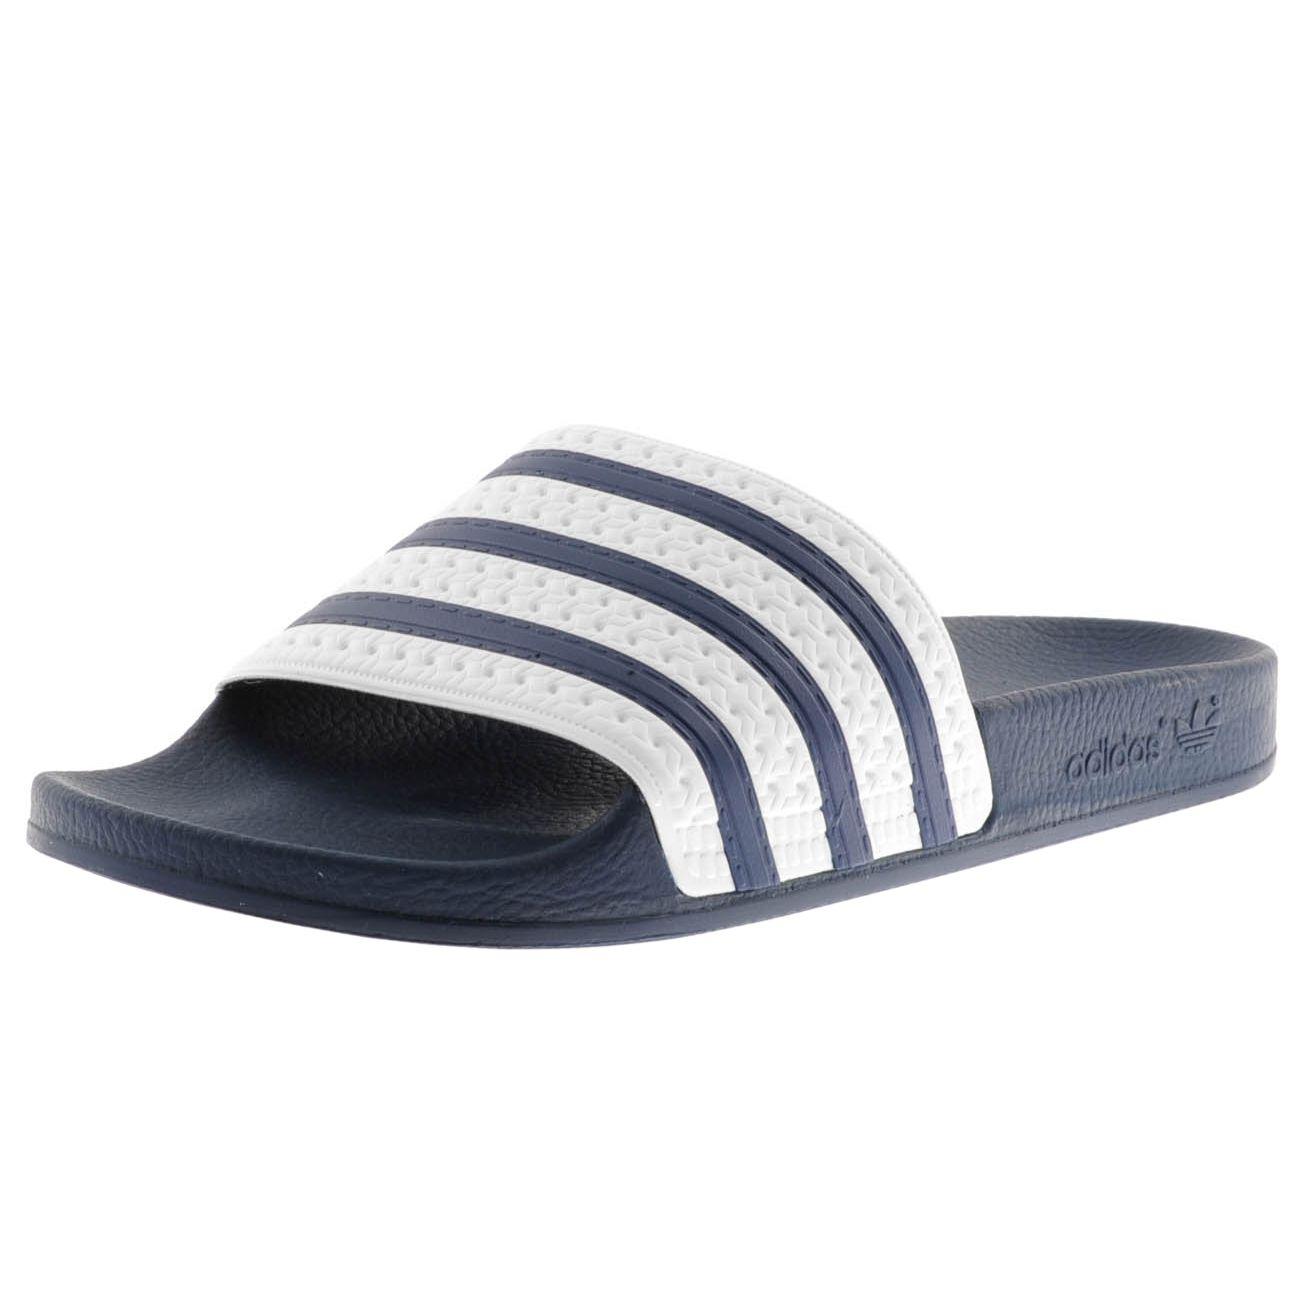 c0e0fdf28d719d Adidas Originals Adilette Slides Flip Flops In Adiblue Navy. Be Original  even at the pool!